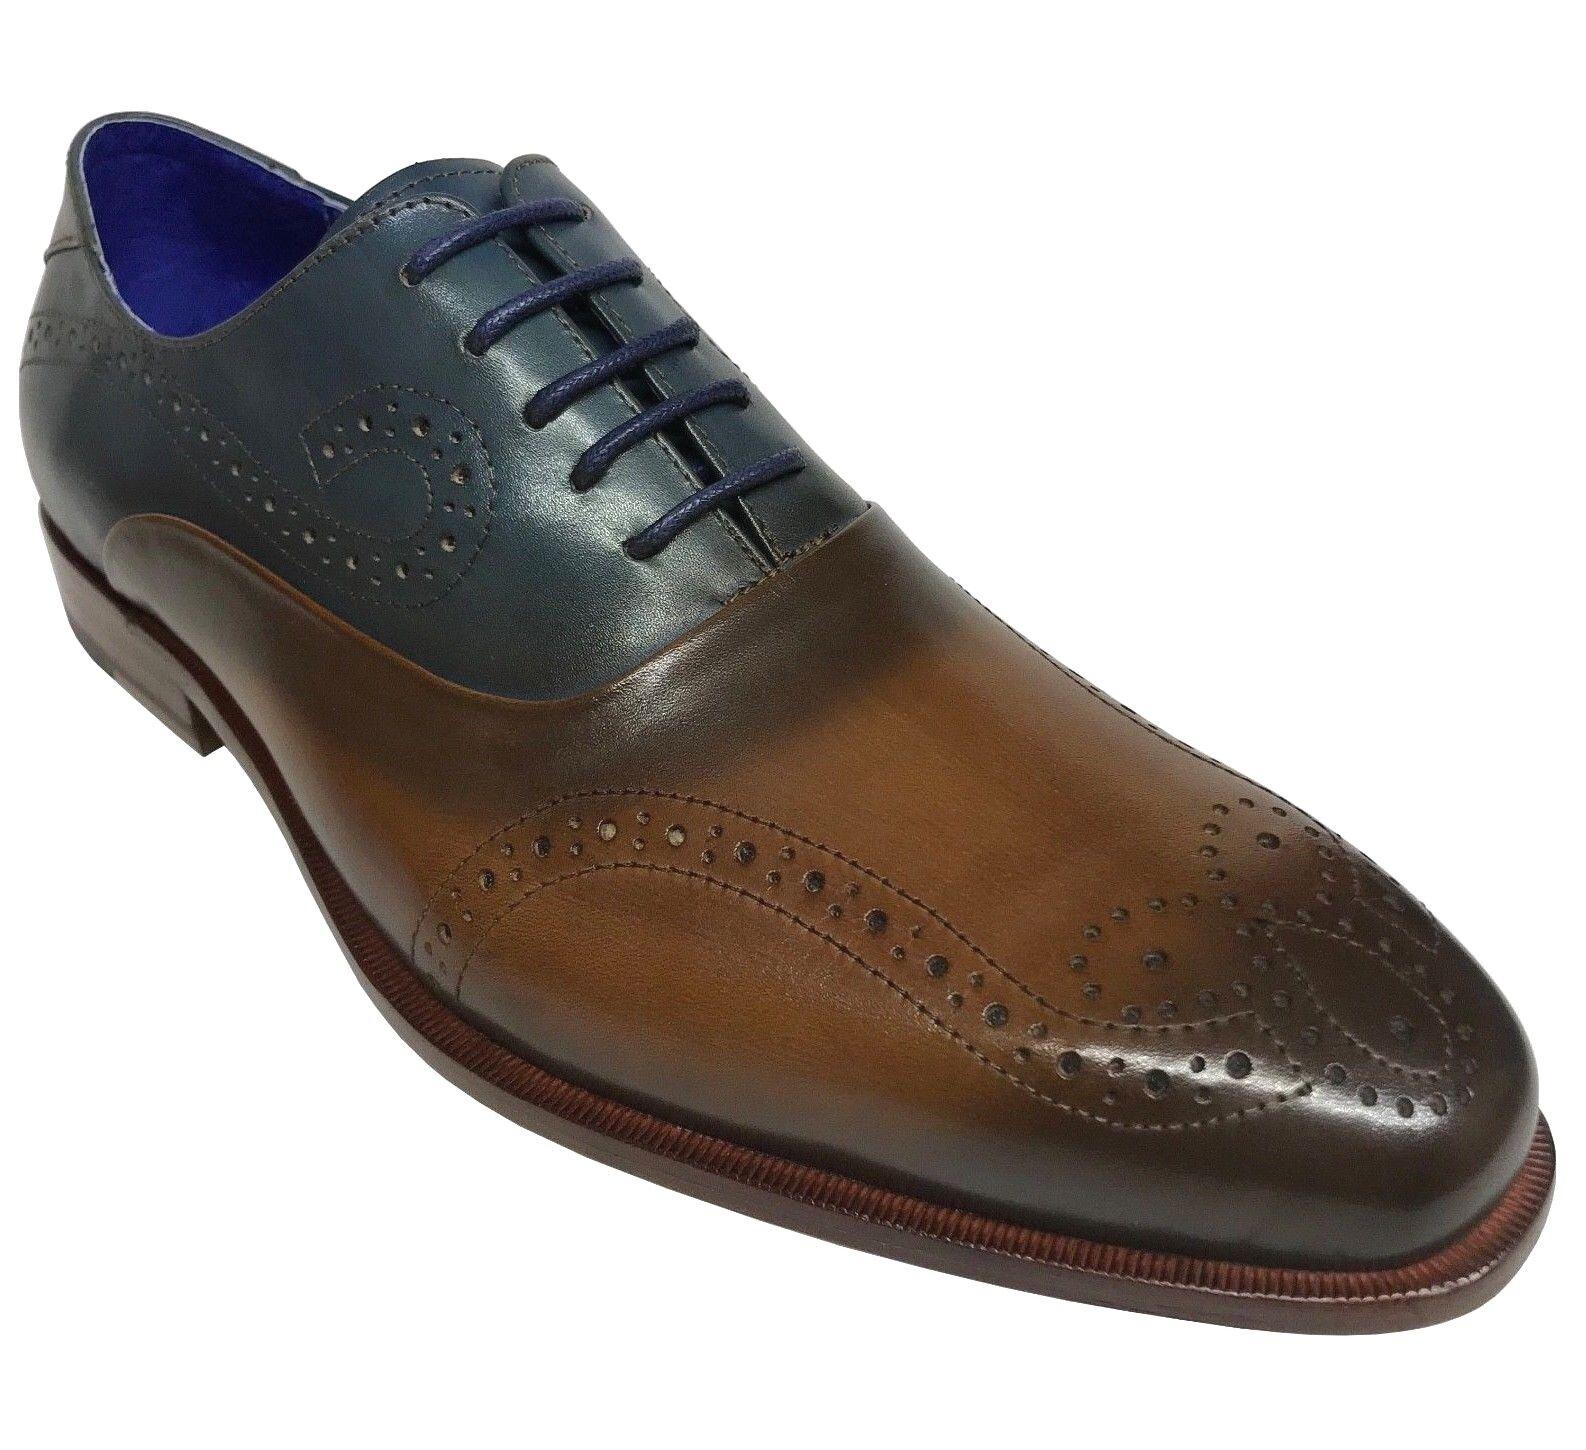 Steven Land Men's Tan Sapphire Genuine Leather Oxford Dress shoes SL0060